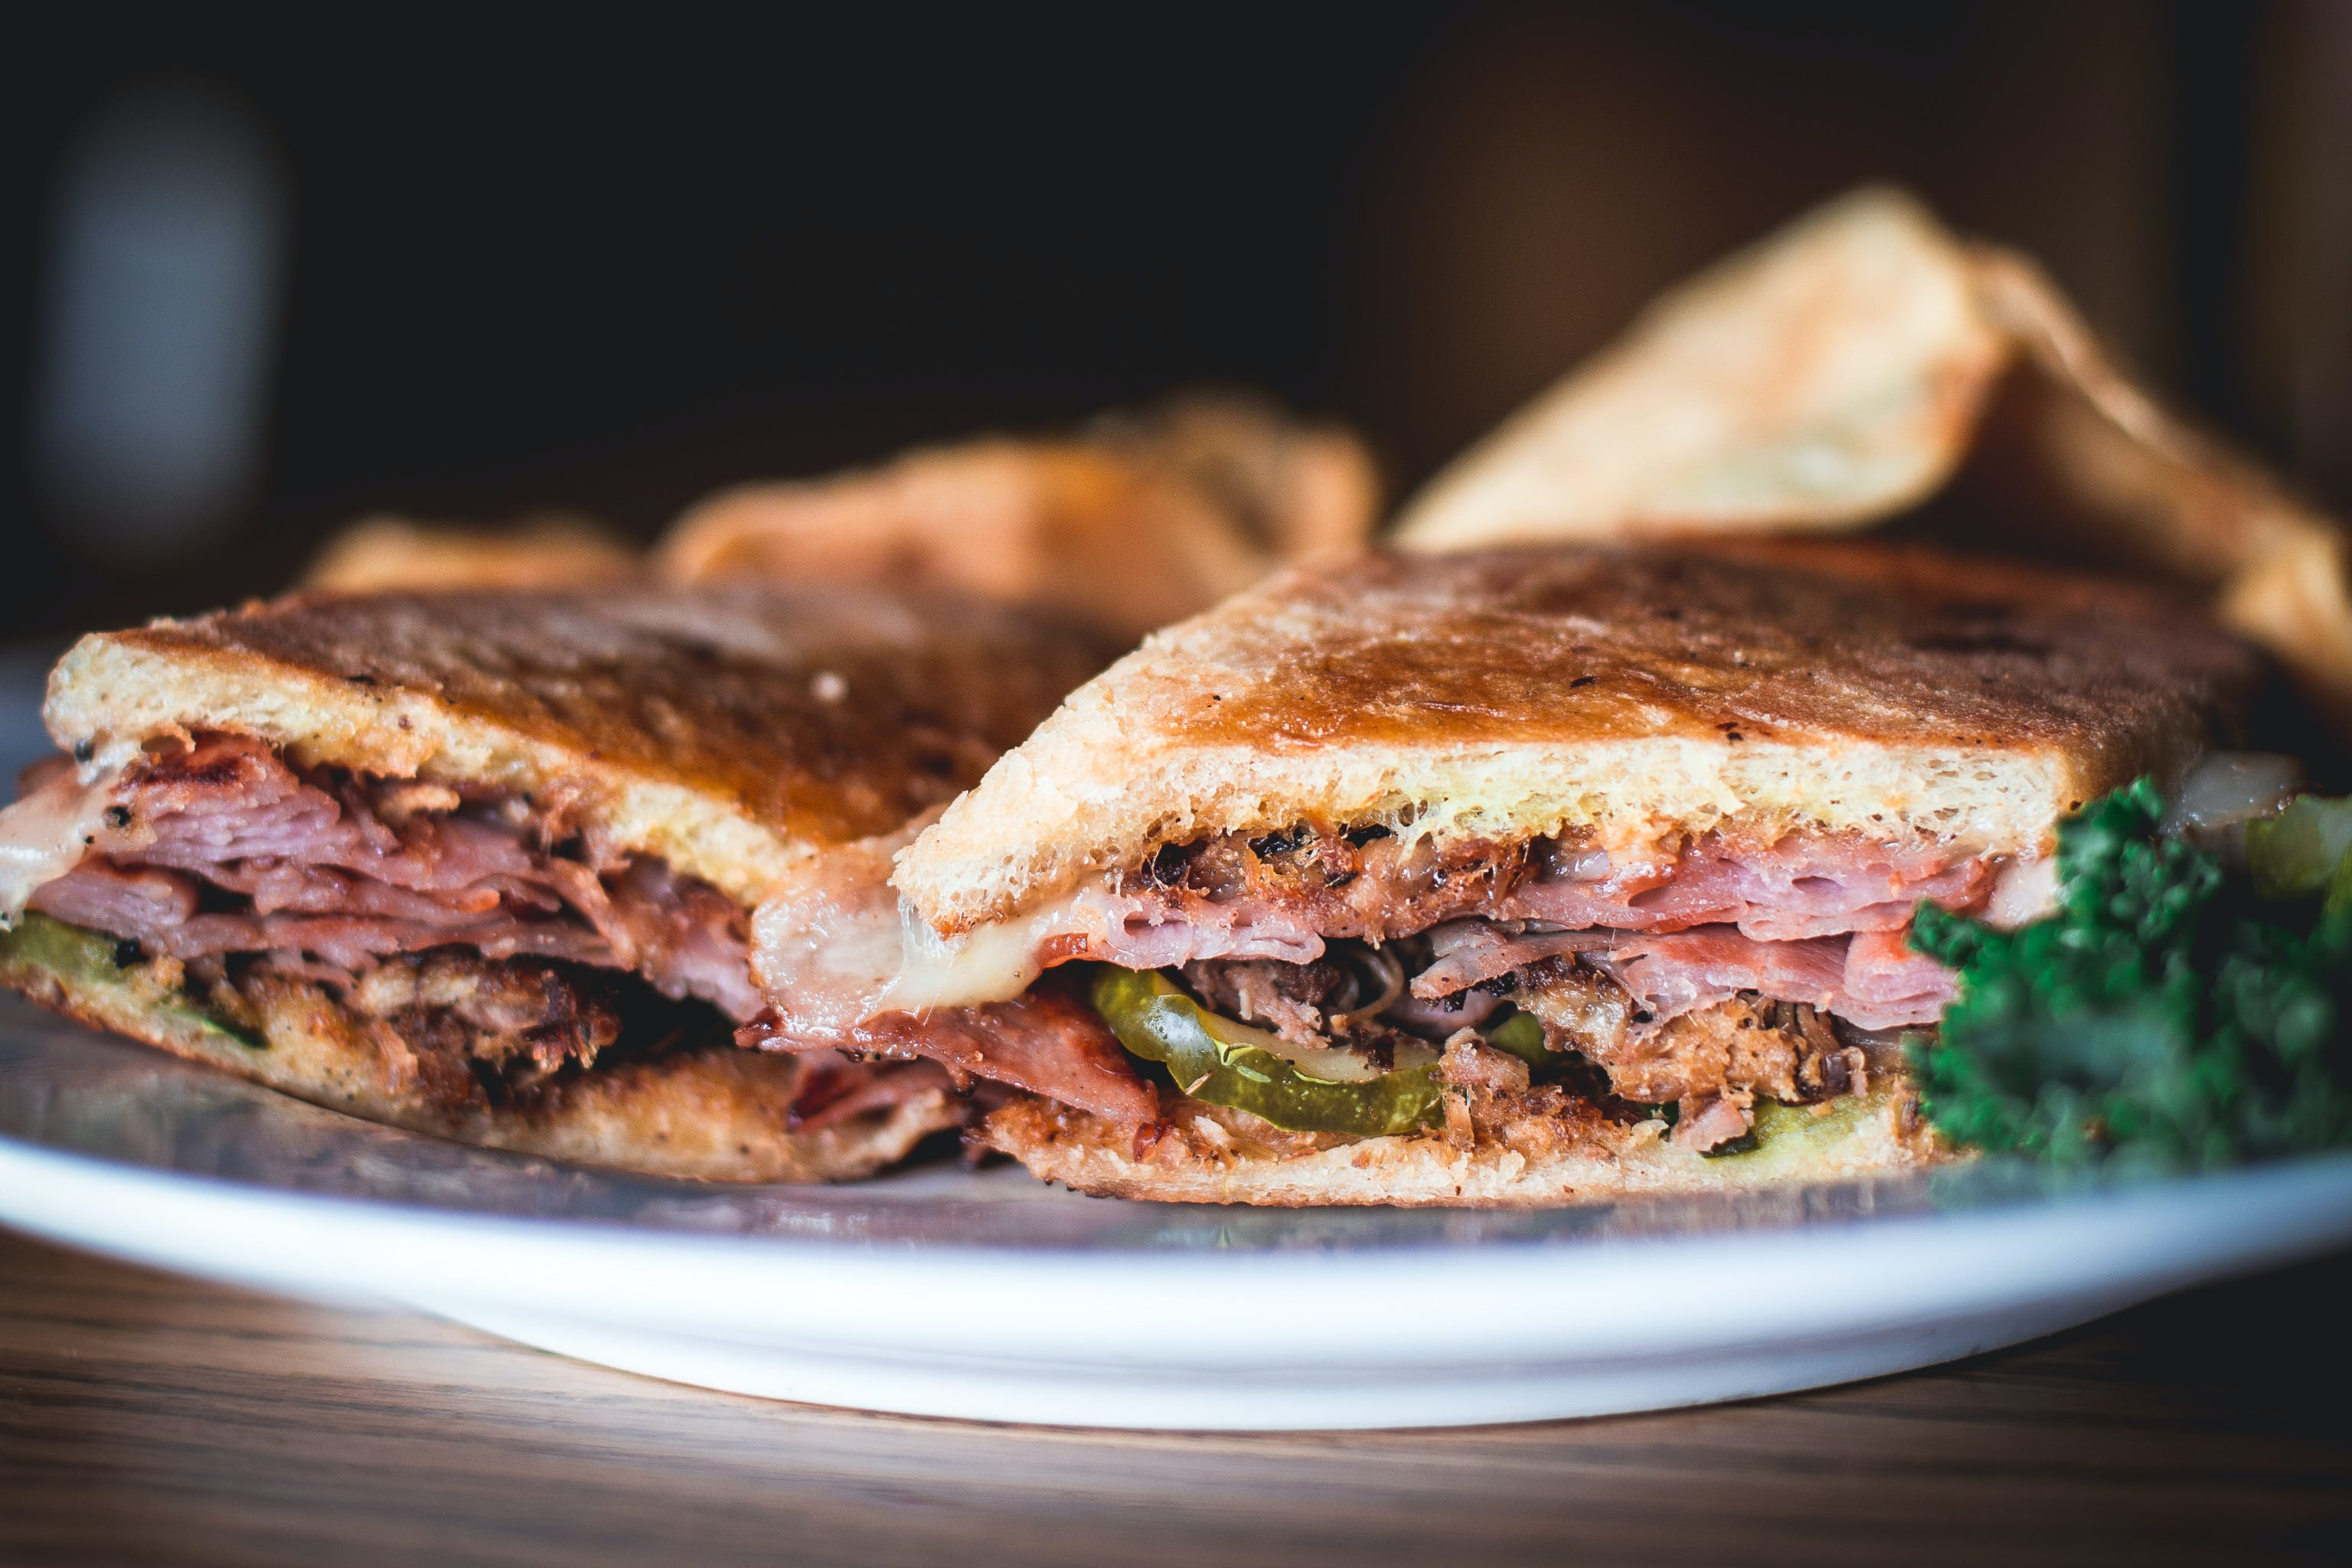 Cuban Jack Sandwich from Set'em Up Jacks in Lawrence, KS